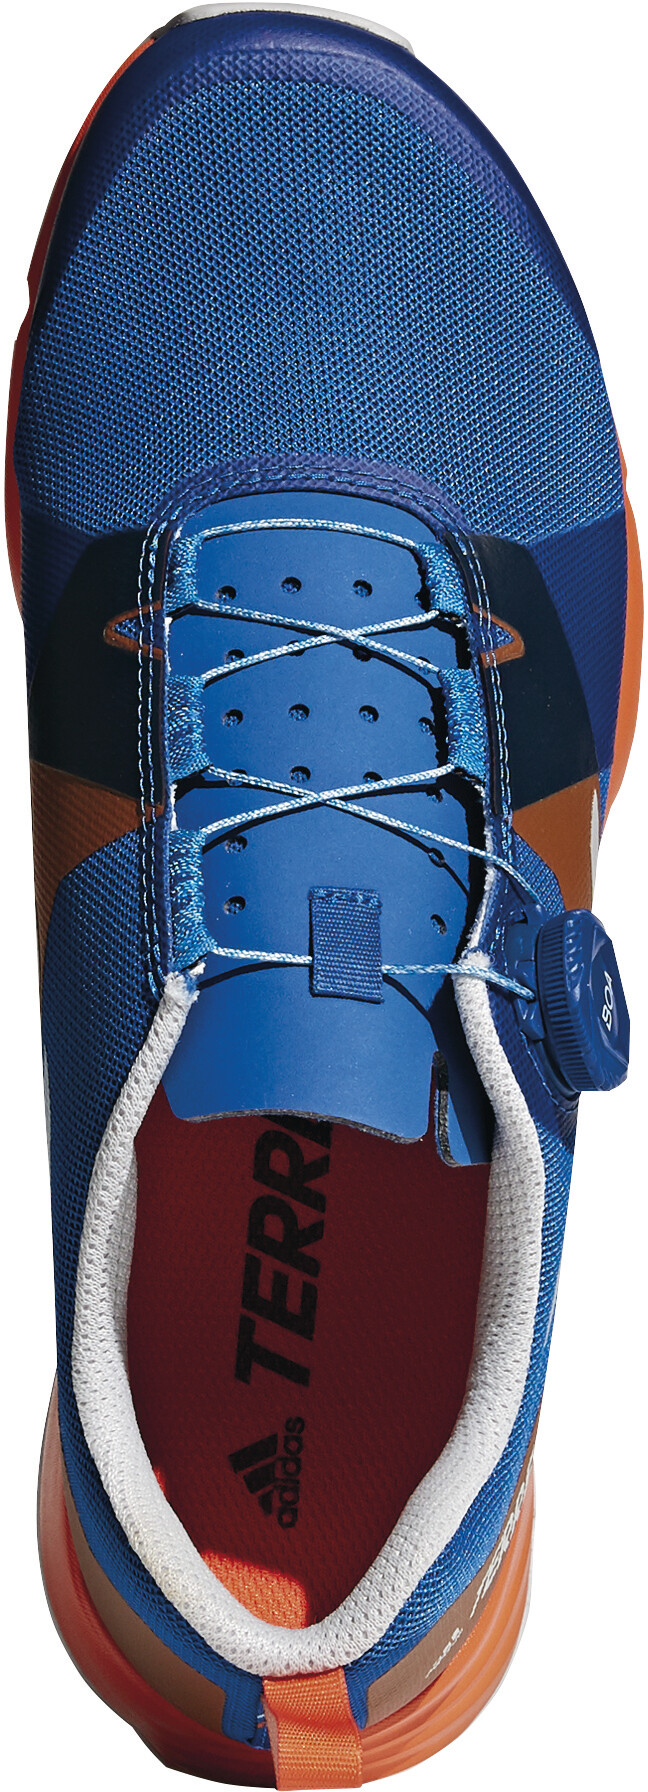 Orangebleu Sur Chaussures Two Homme Boa Adidas Terrex Running pHqPwY